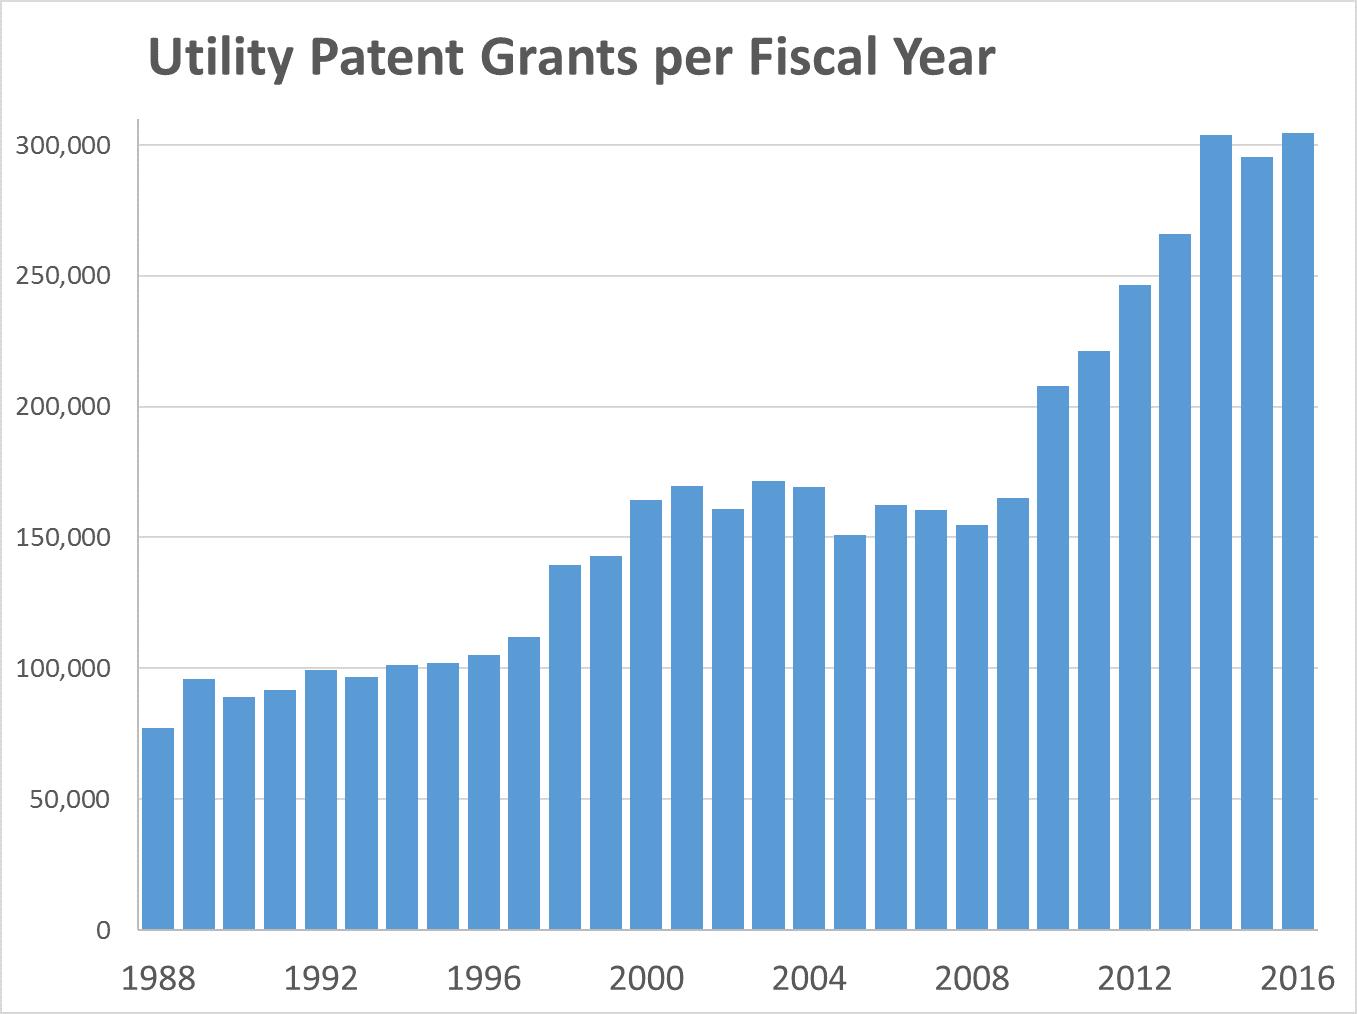 PatentsPerFiscalYear